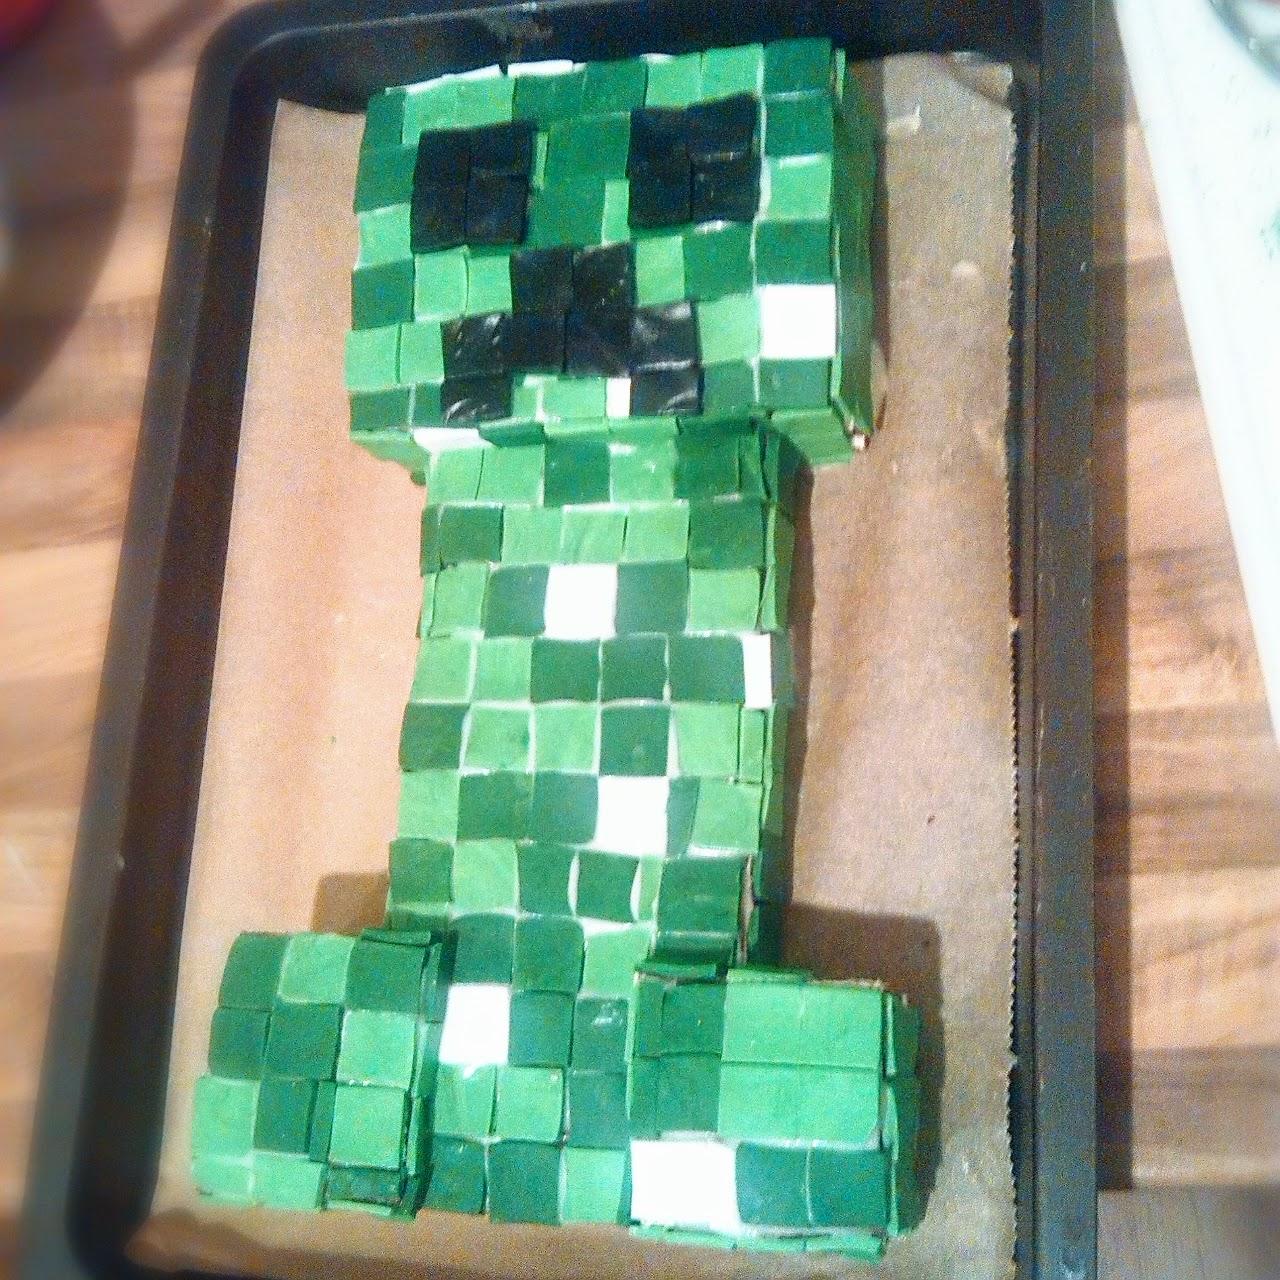 Midori S Blog Minecraft Creeper Kuchen